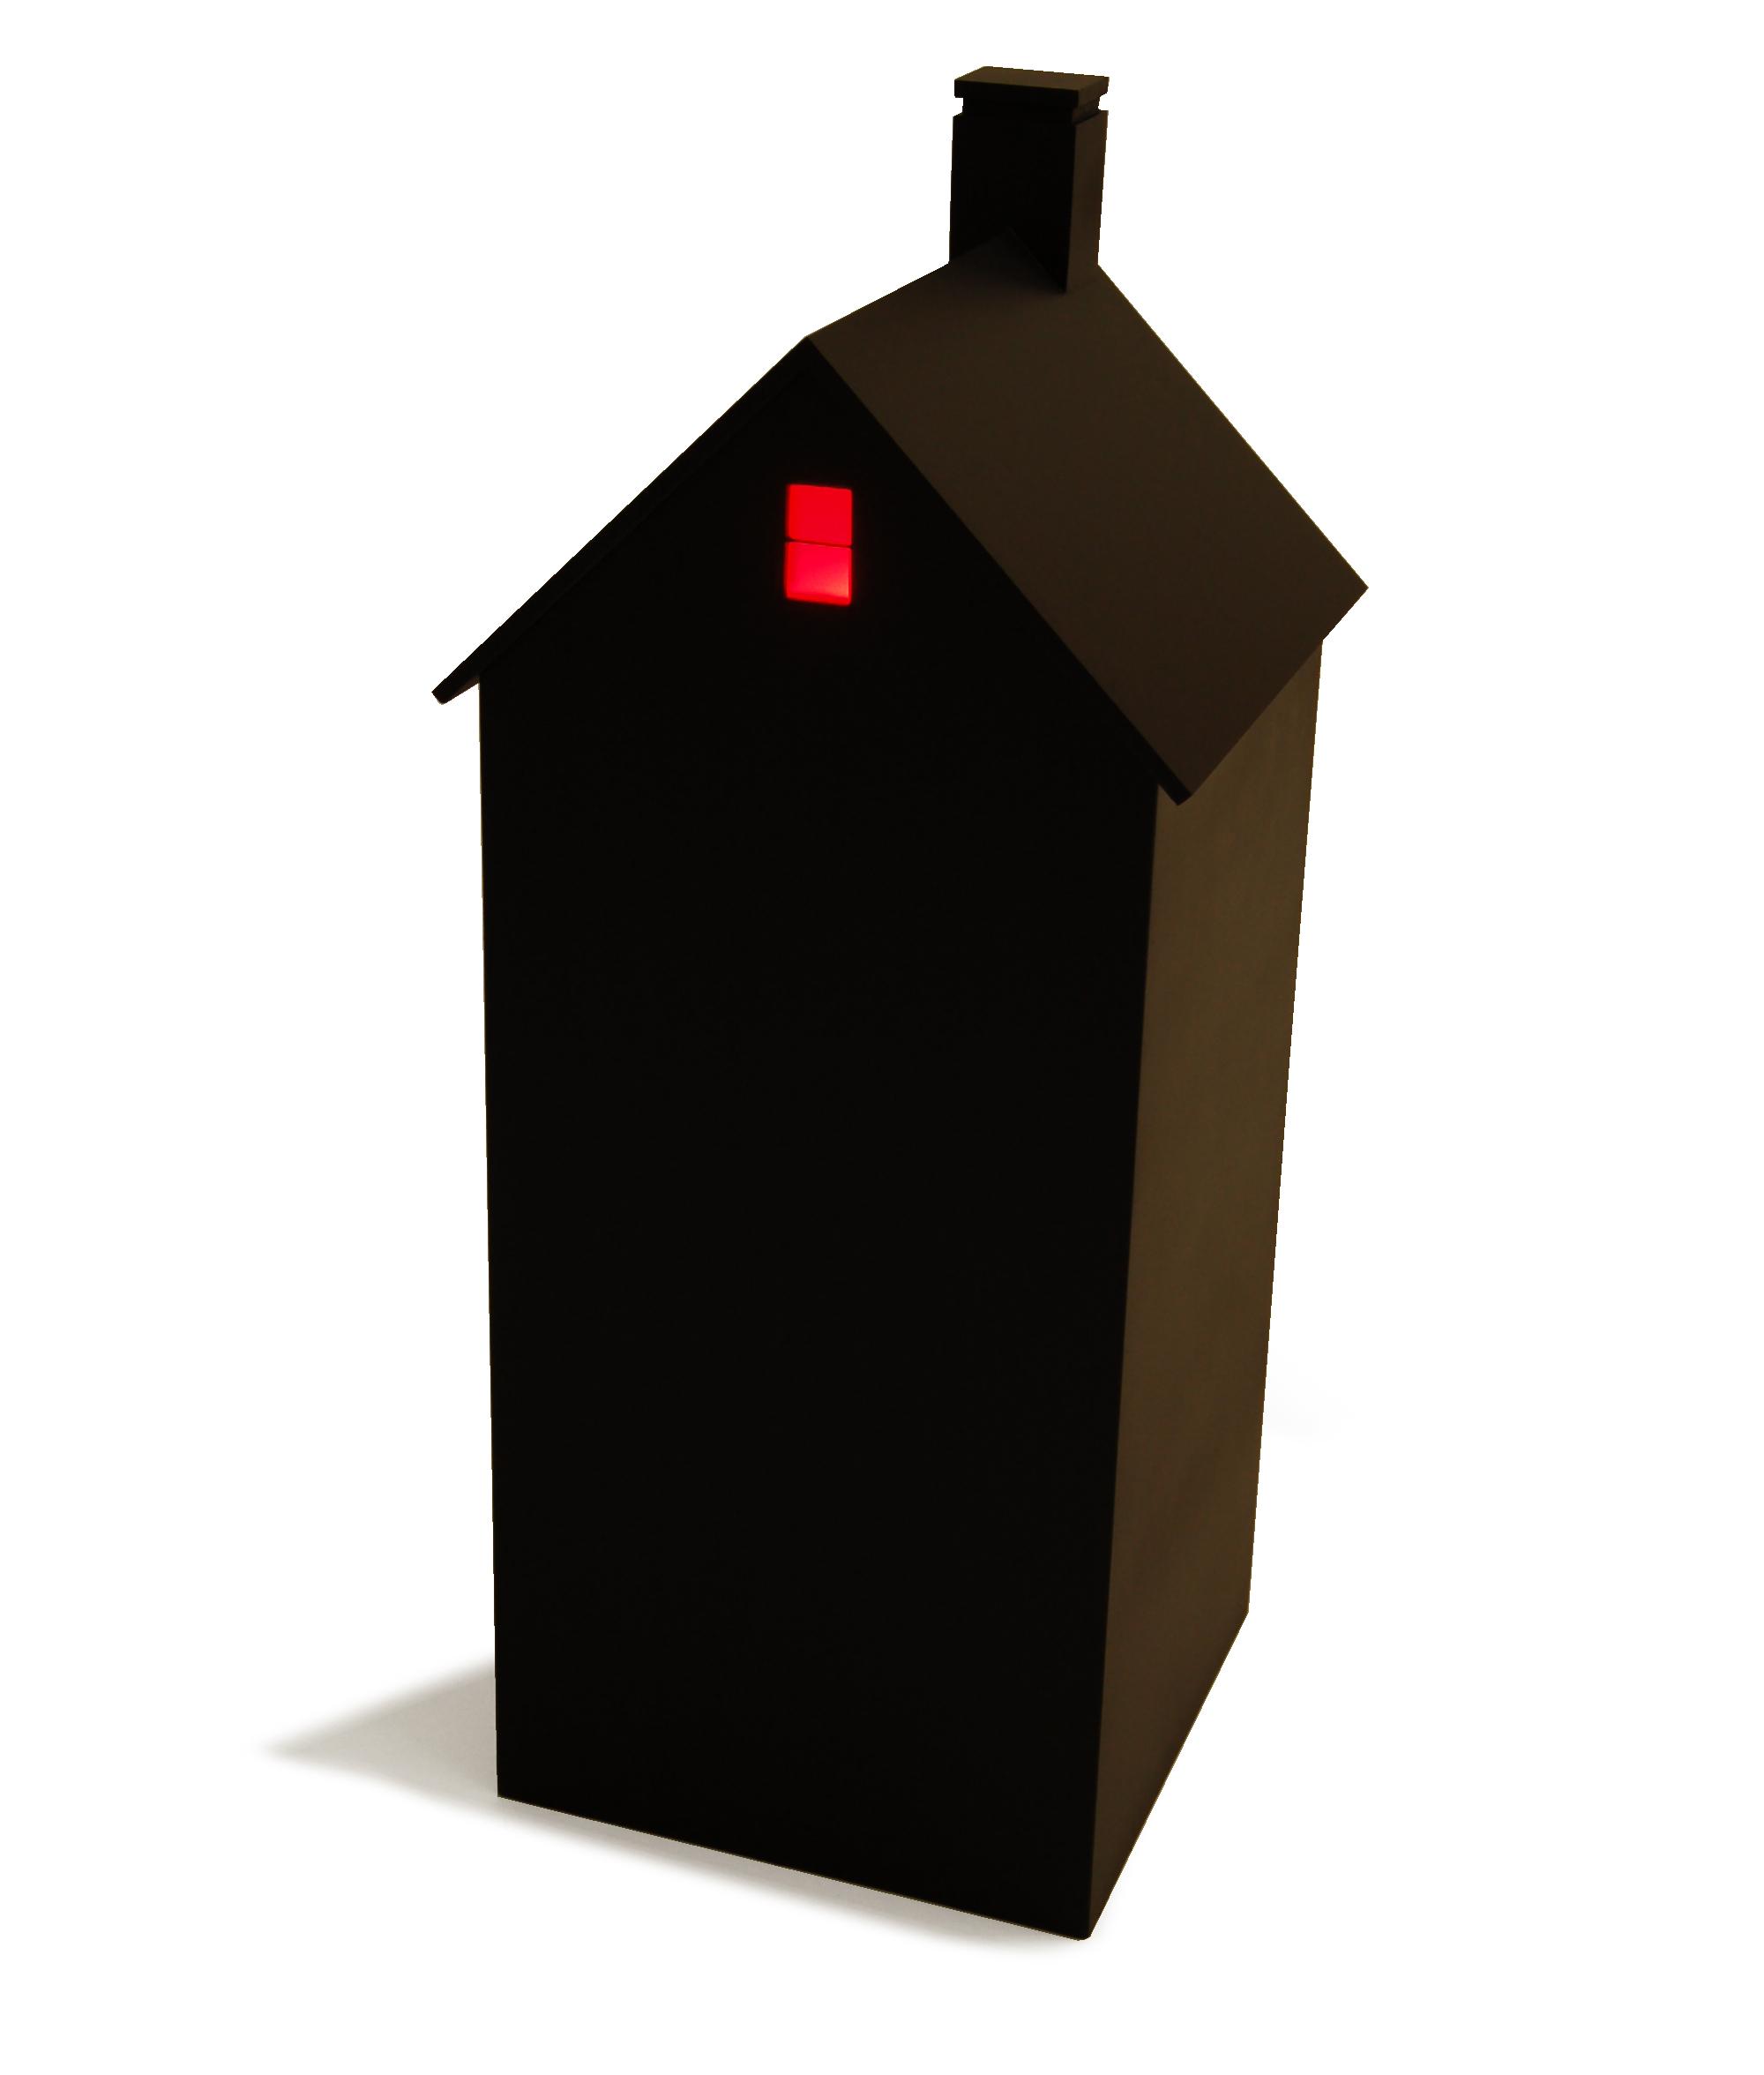 "House at Night III (Attic),  2015, 11"" x 11"" x 27"",painted wood, colored plexiglass, light bulb, battery."